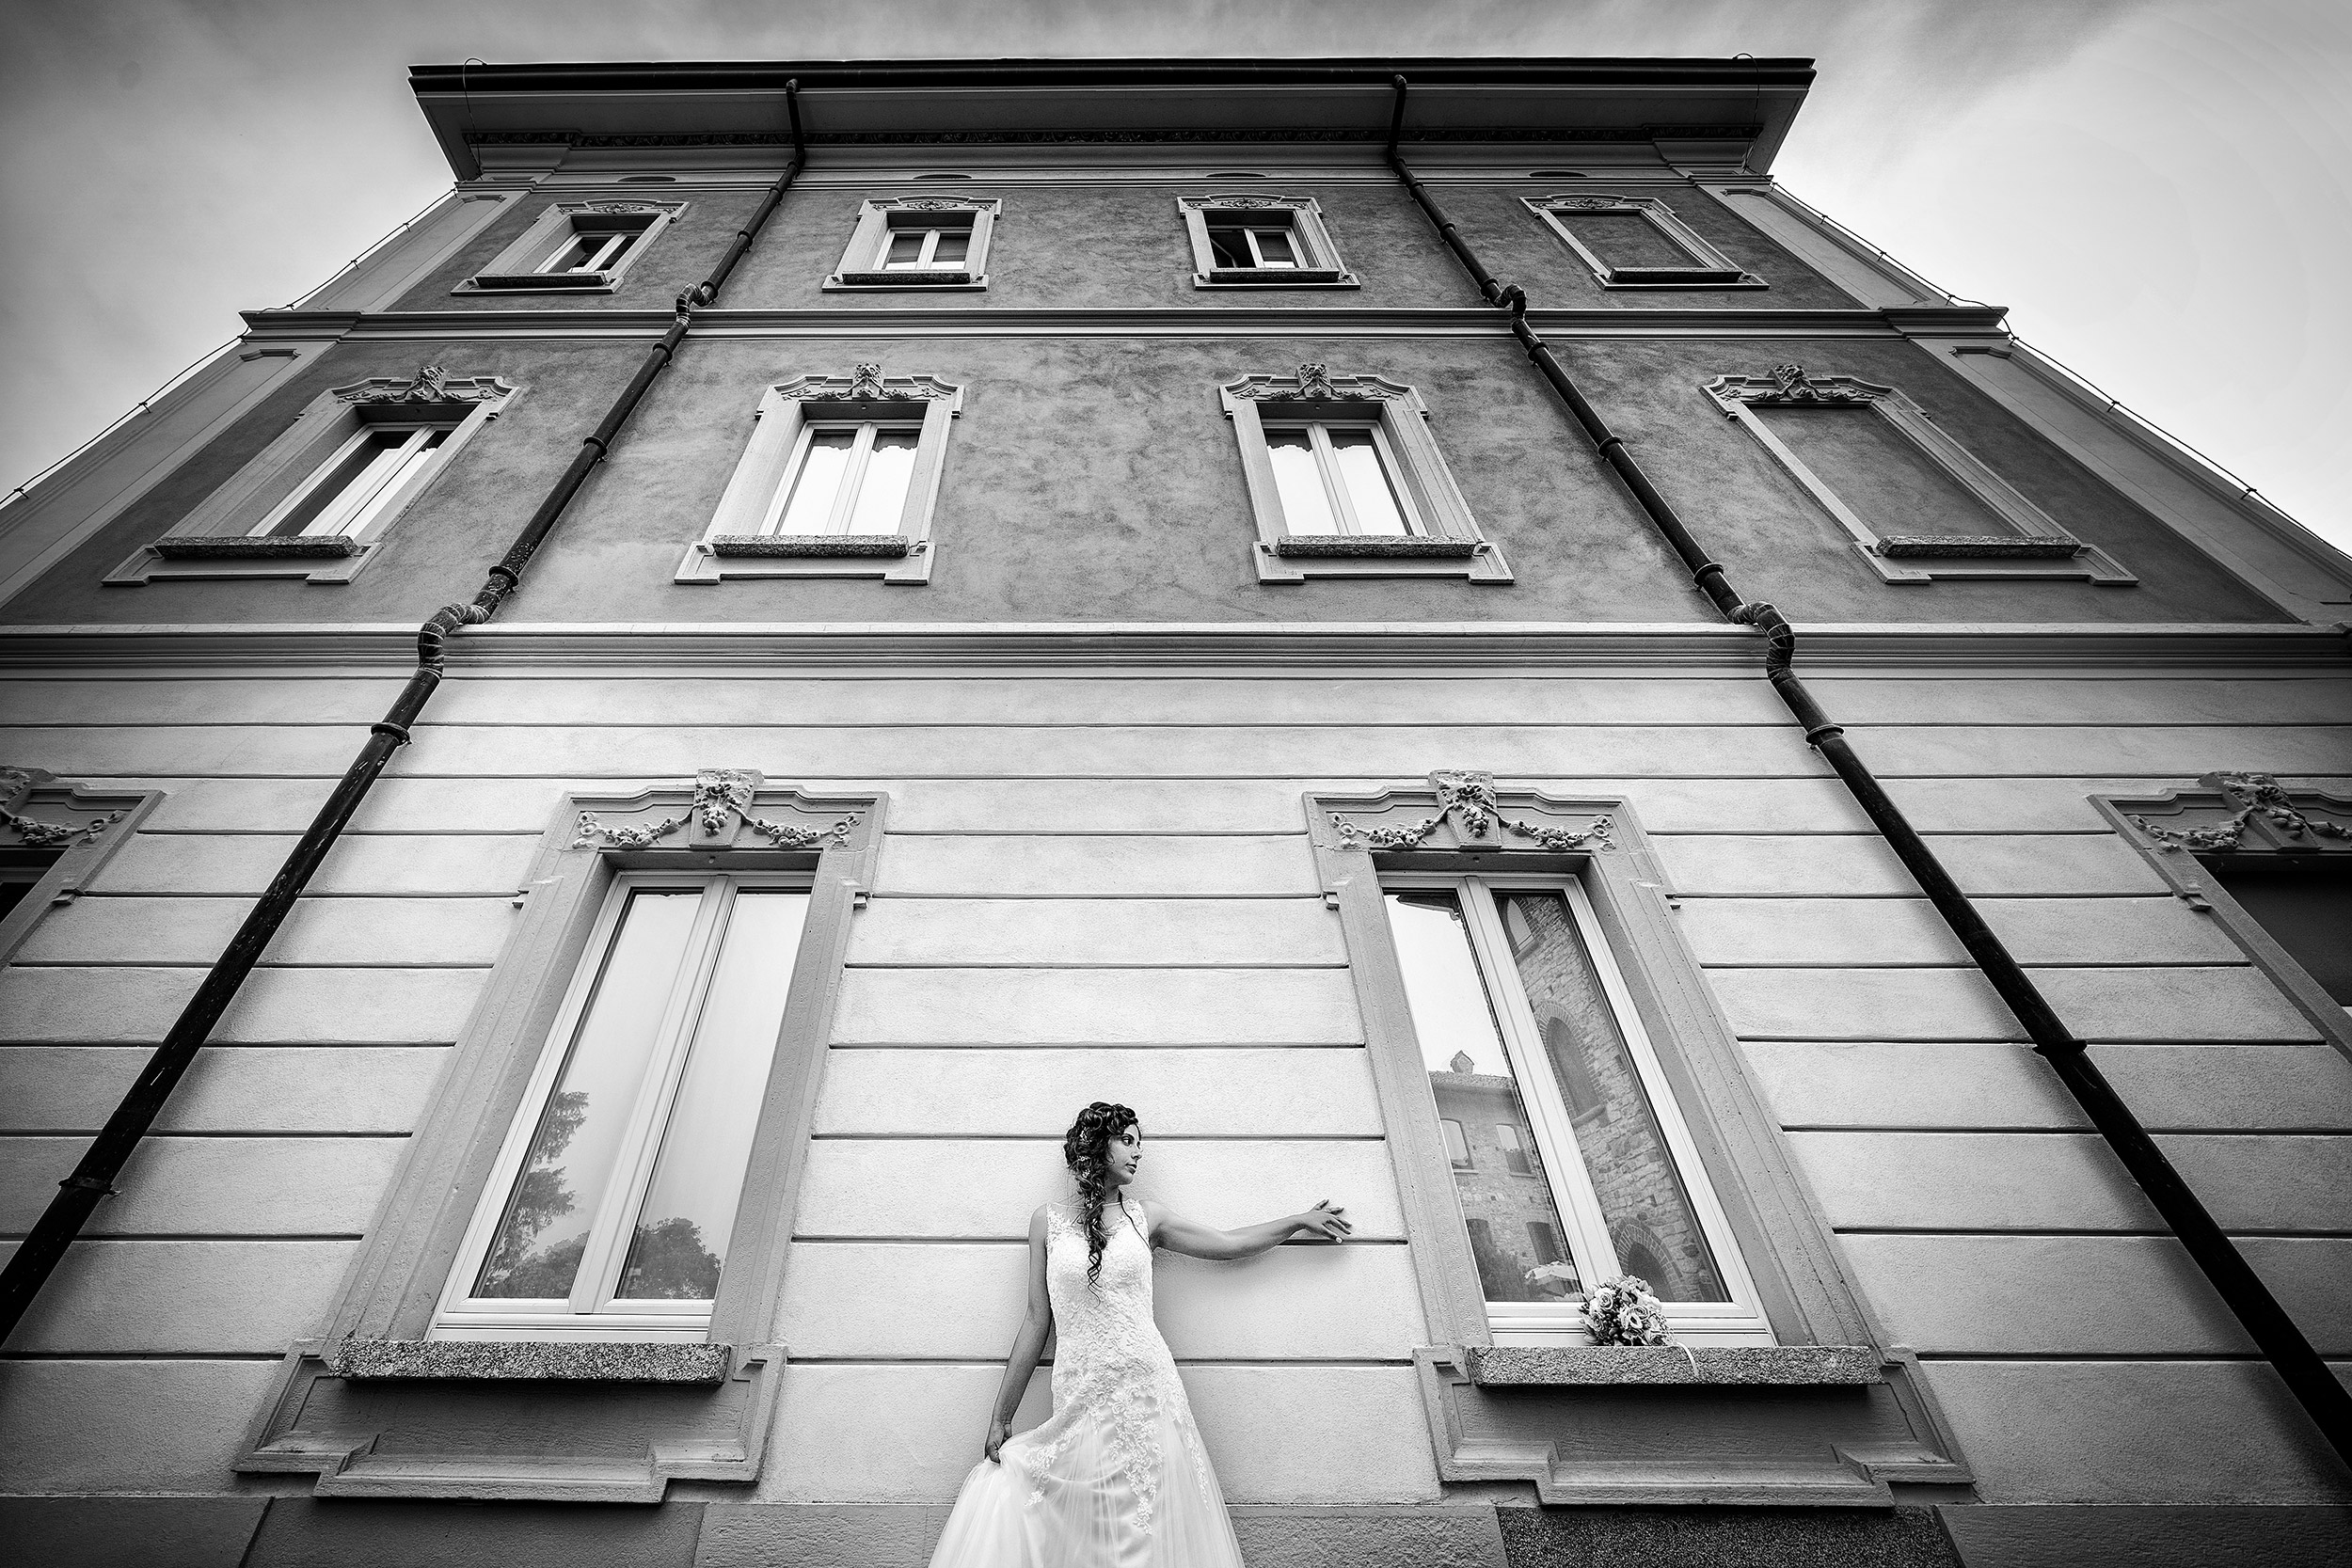 001 reportage wedding sposi foto matrimonio castello casiglio erba como 1